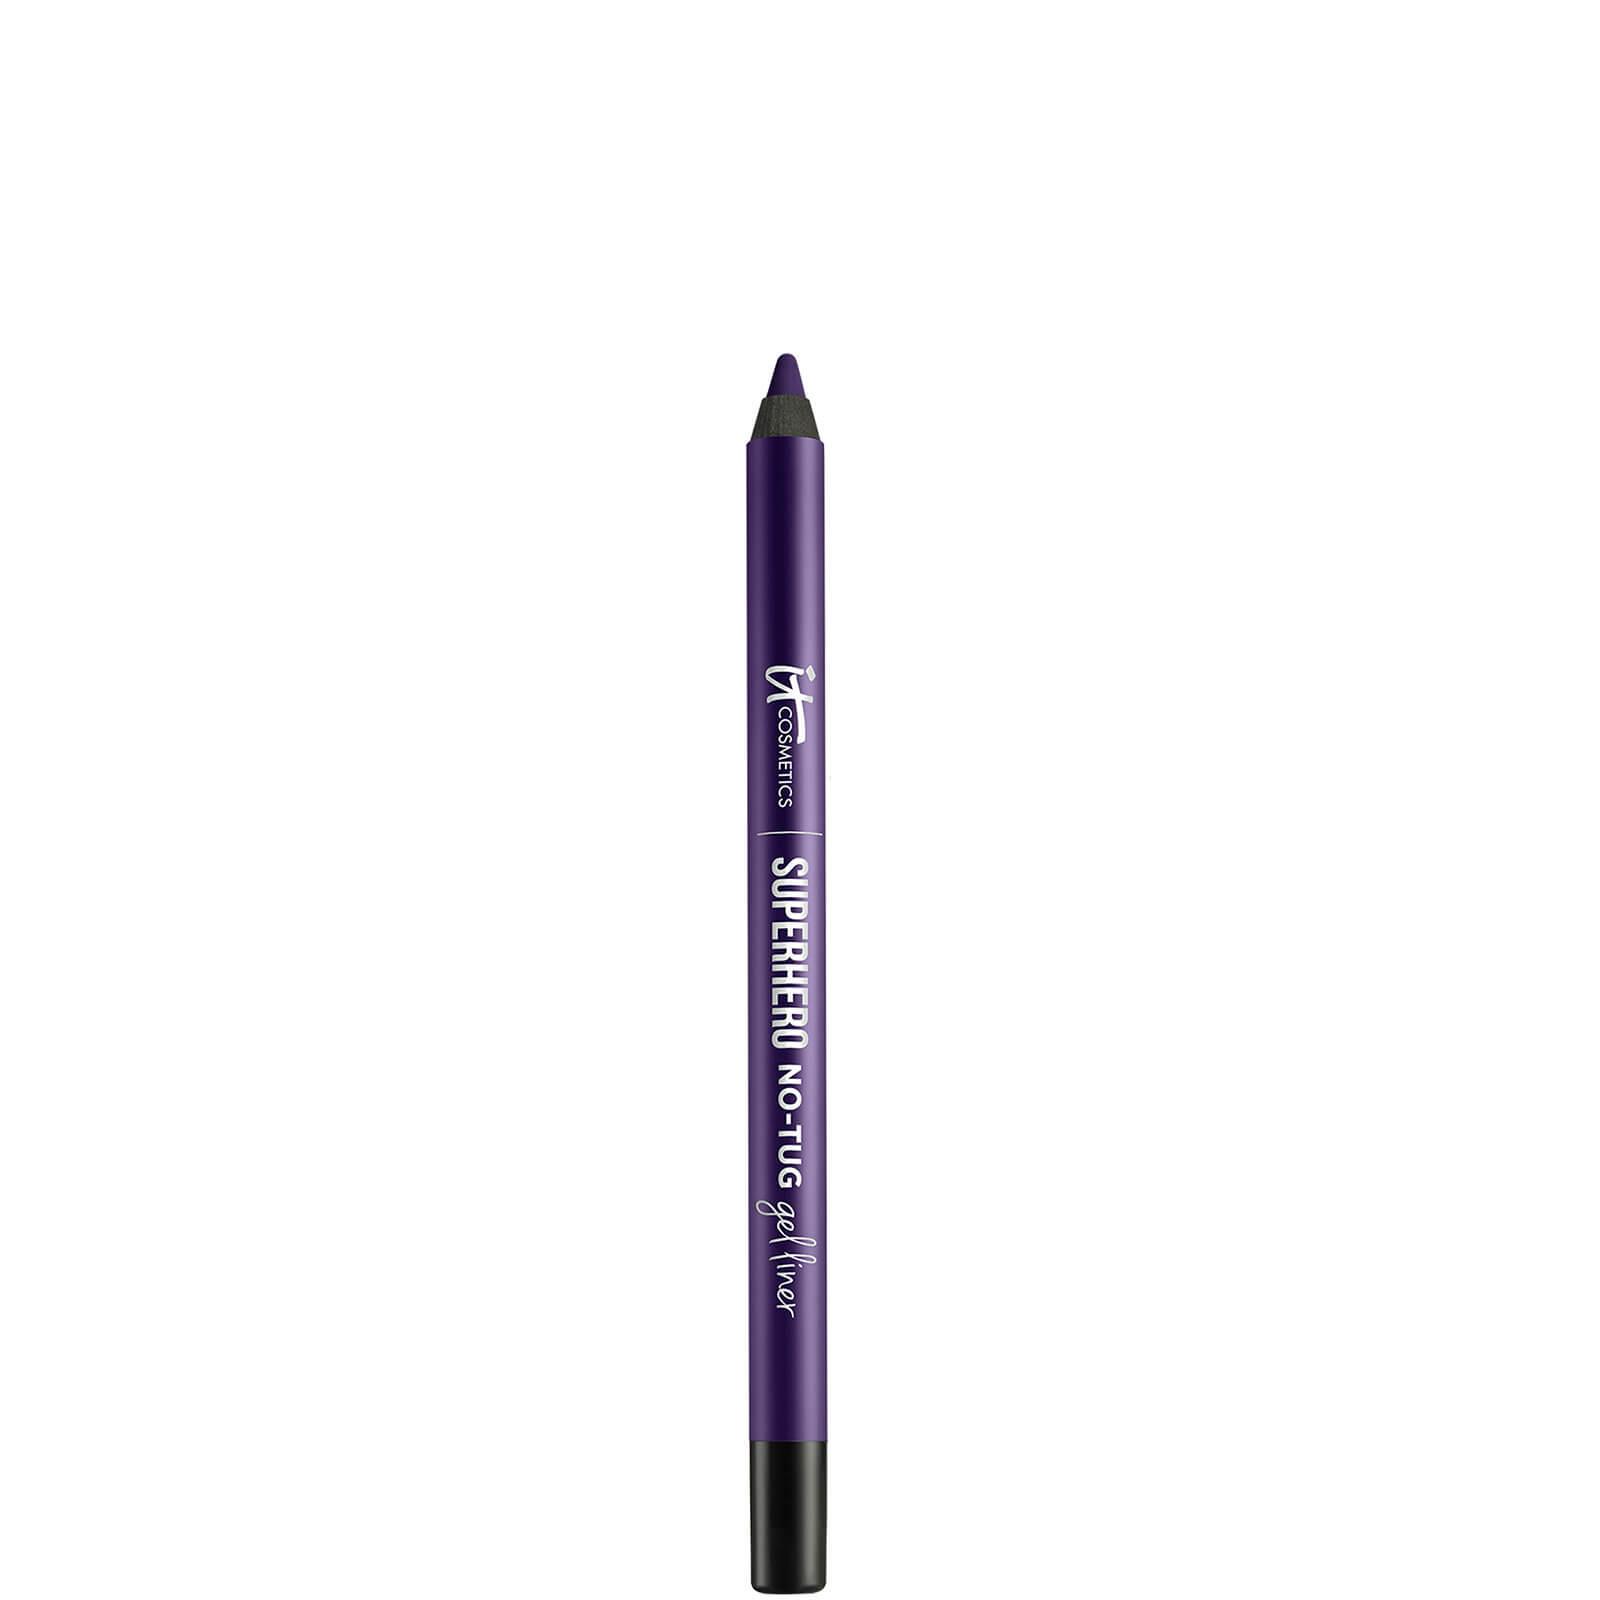 Купить IT Cosmetics Superhero No-Tug Gel Eyeliner 1.2g (Various Shades) - Powerful Plum